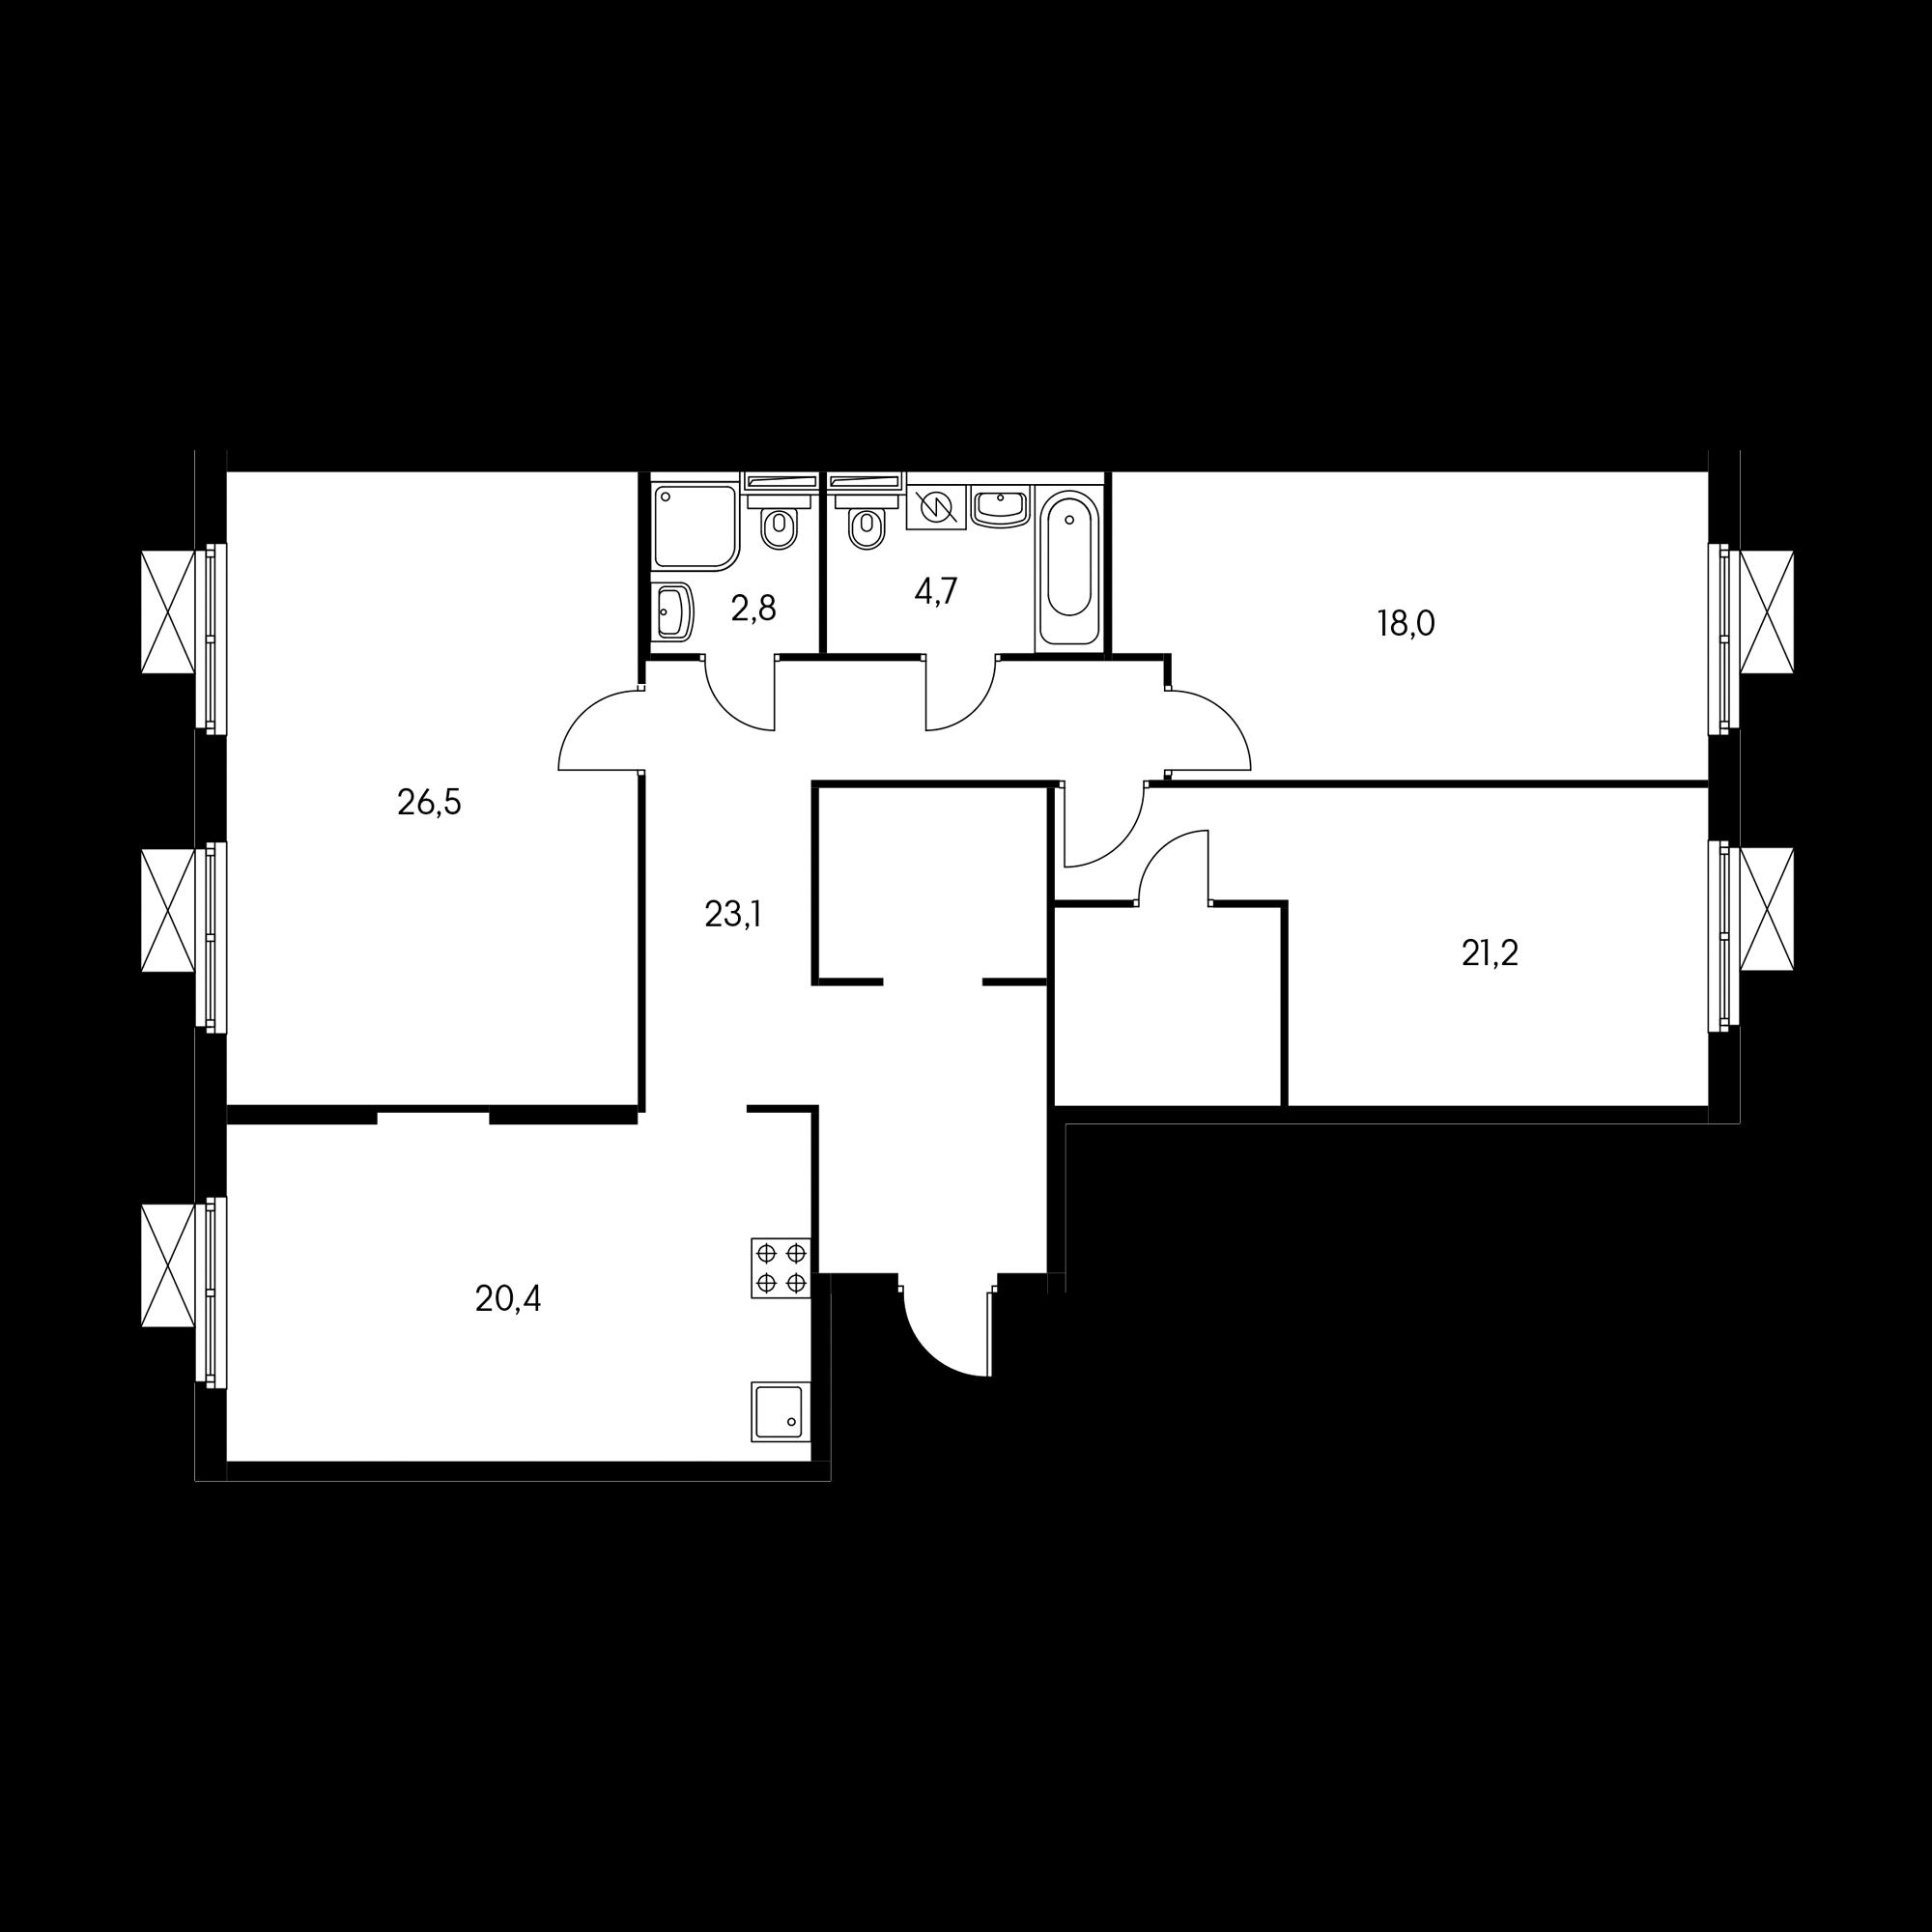 3EL4_9.9